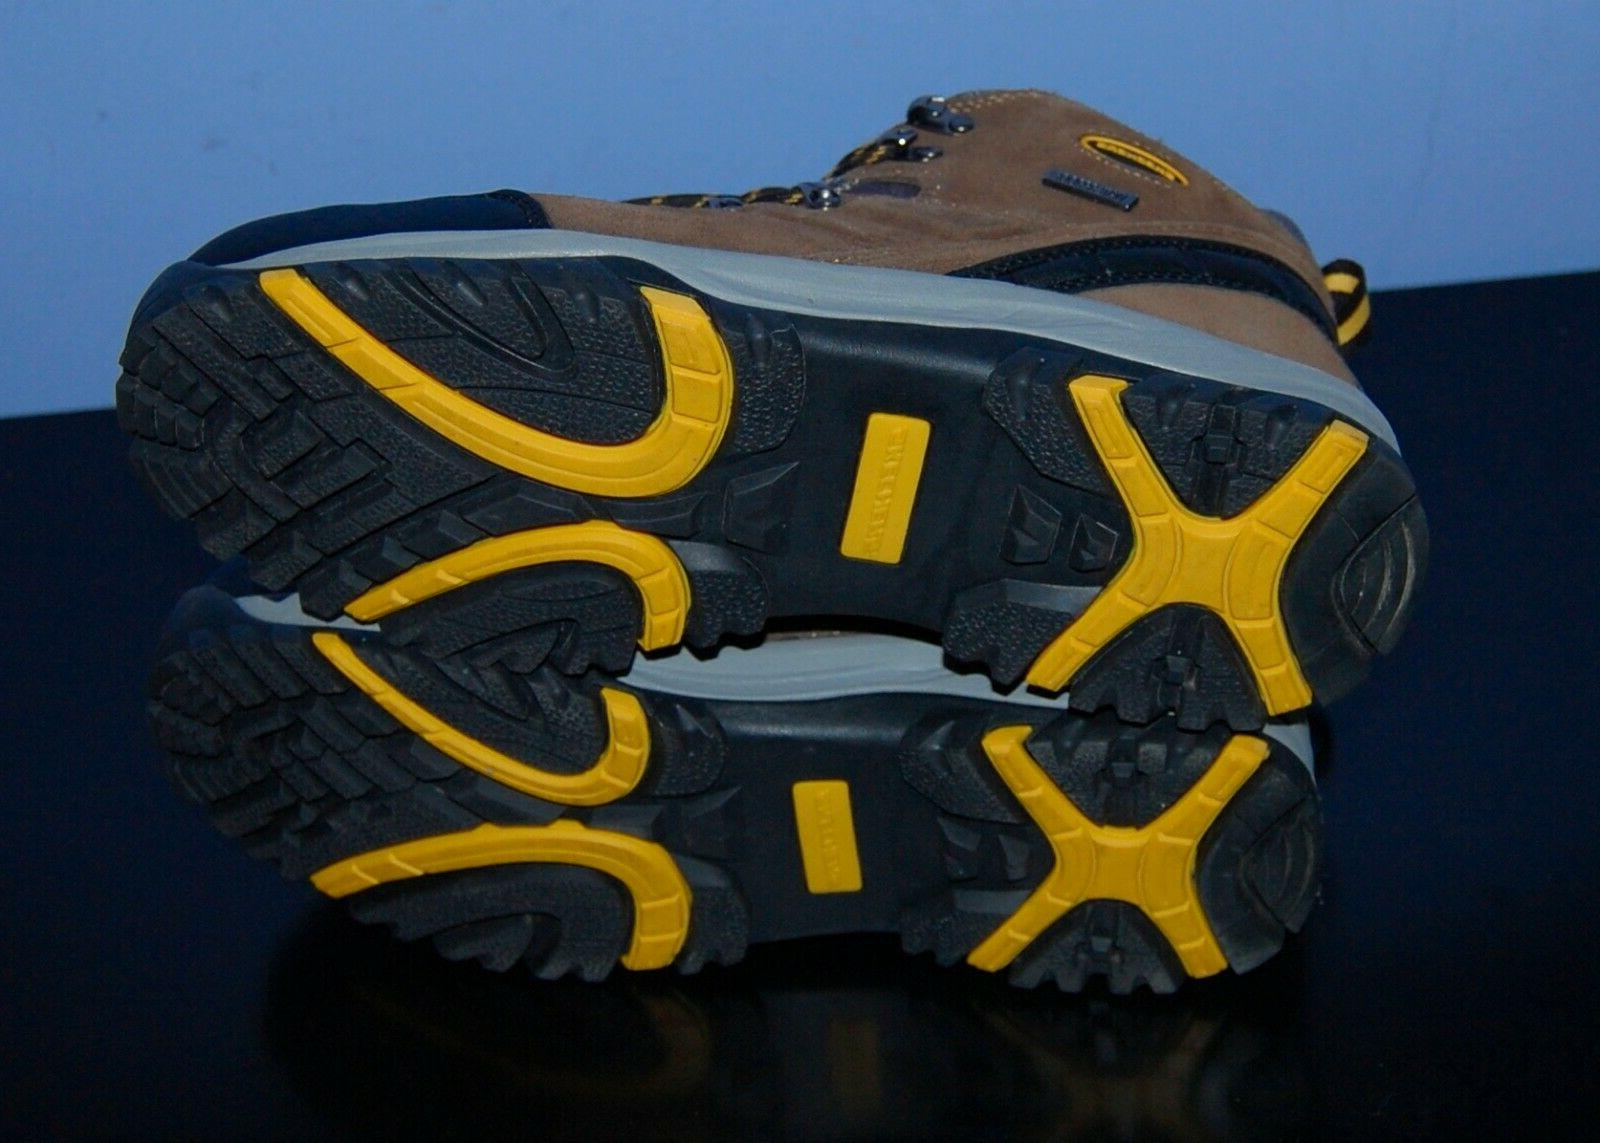 Skechers Water Proof Hiking Size 11